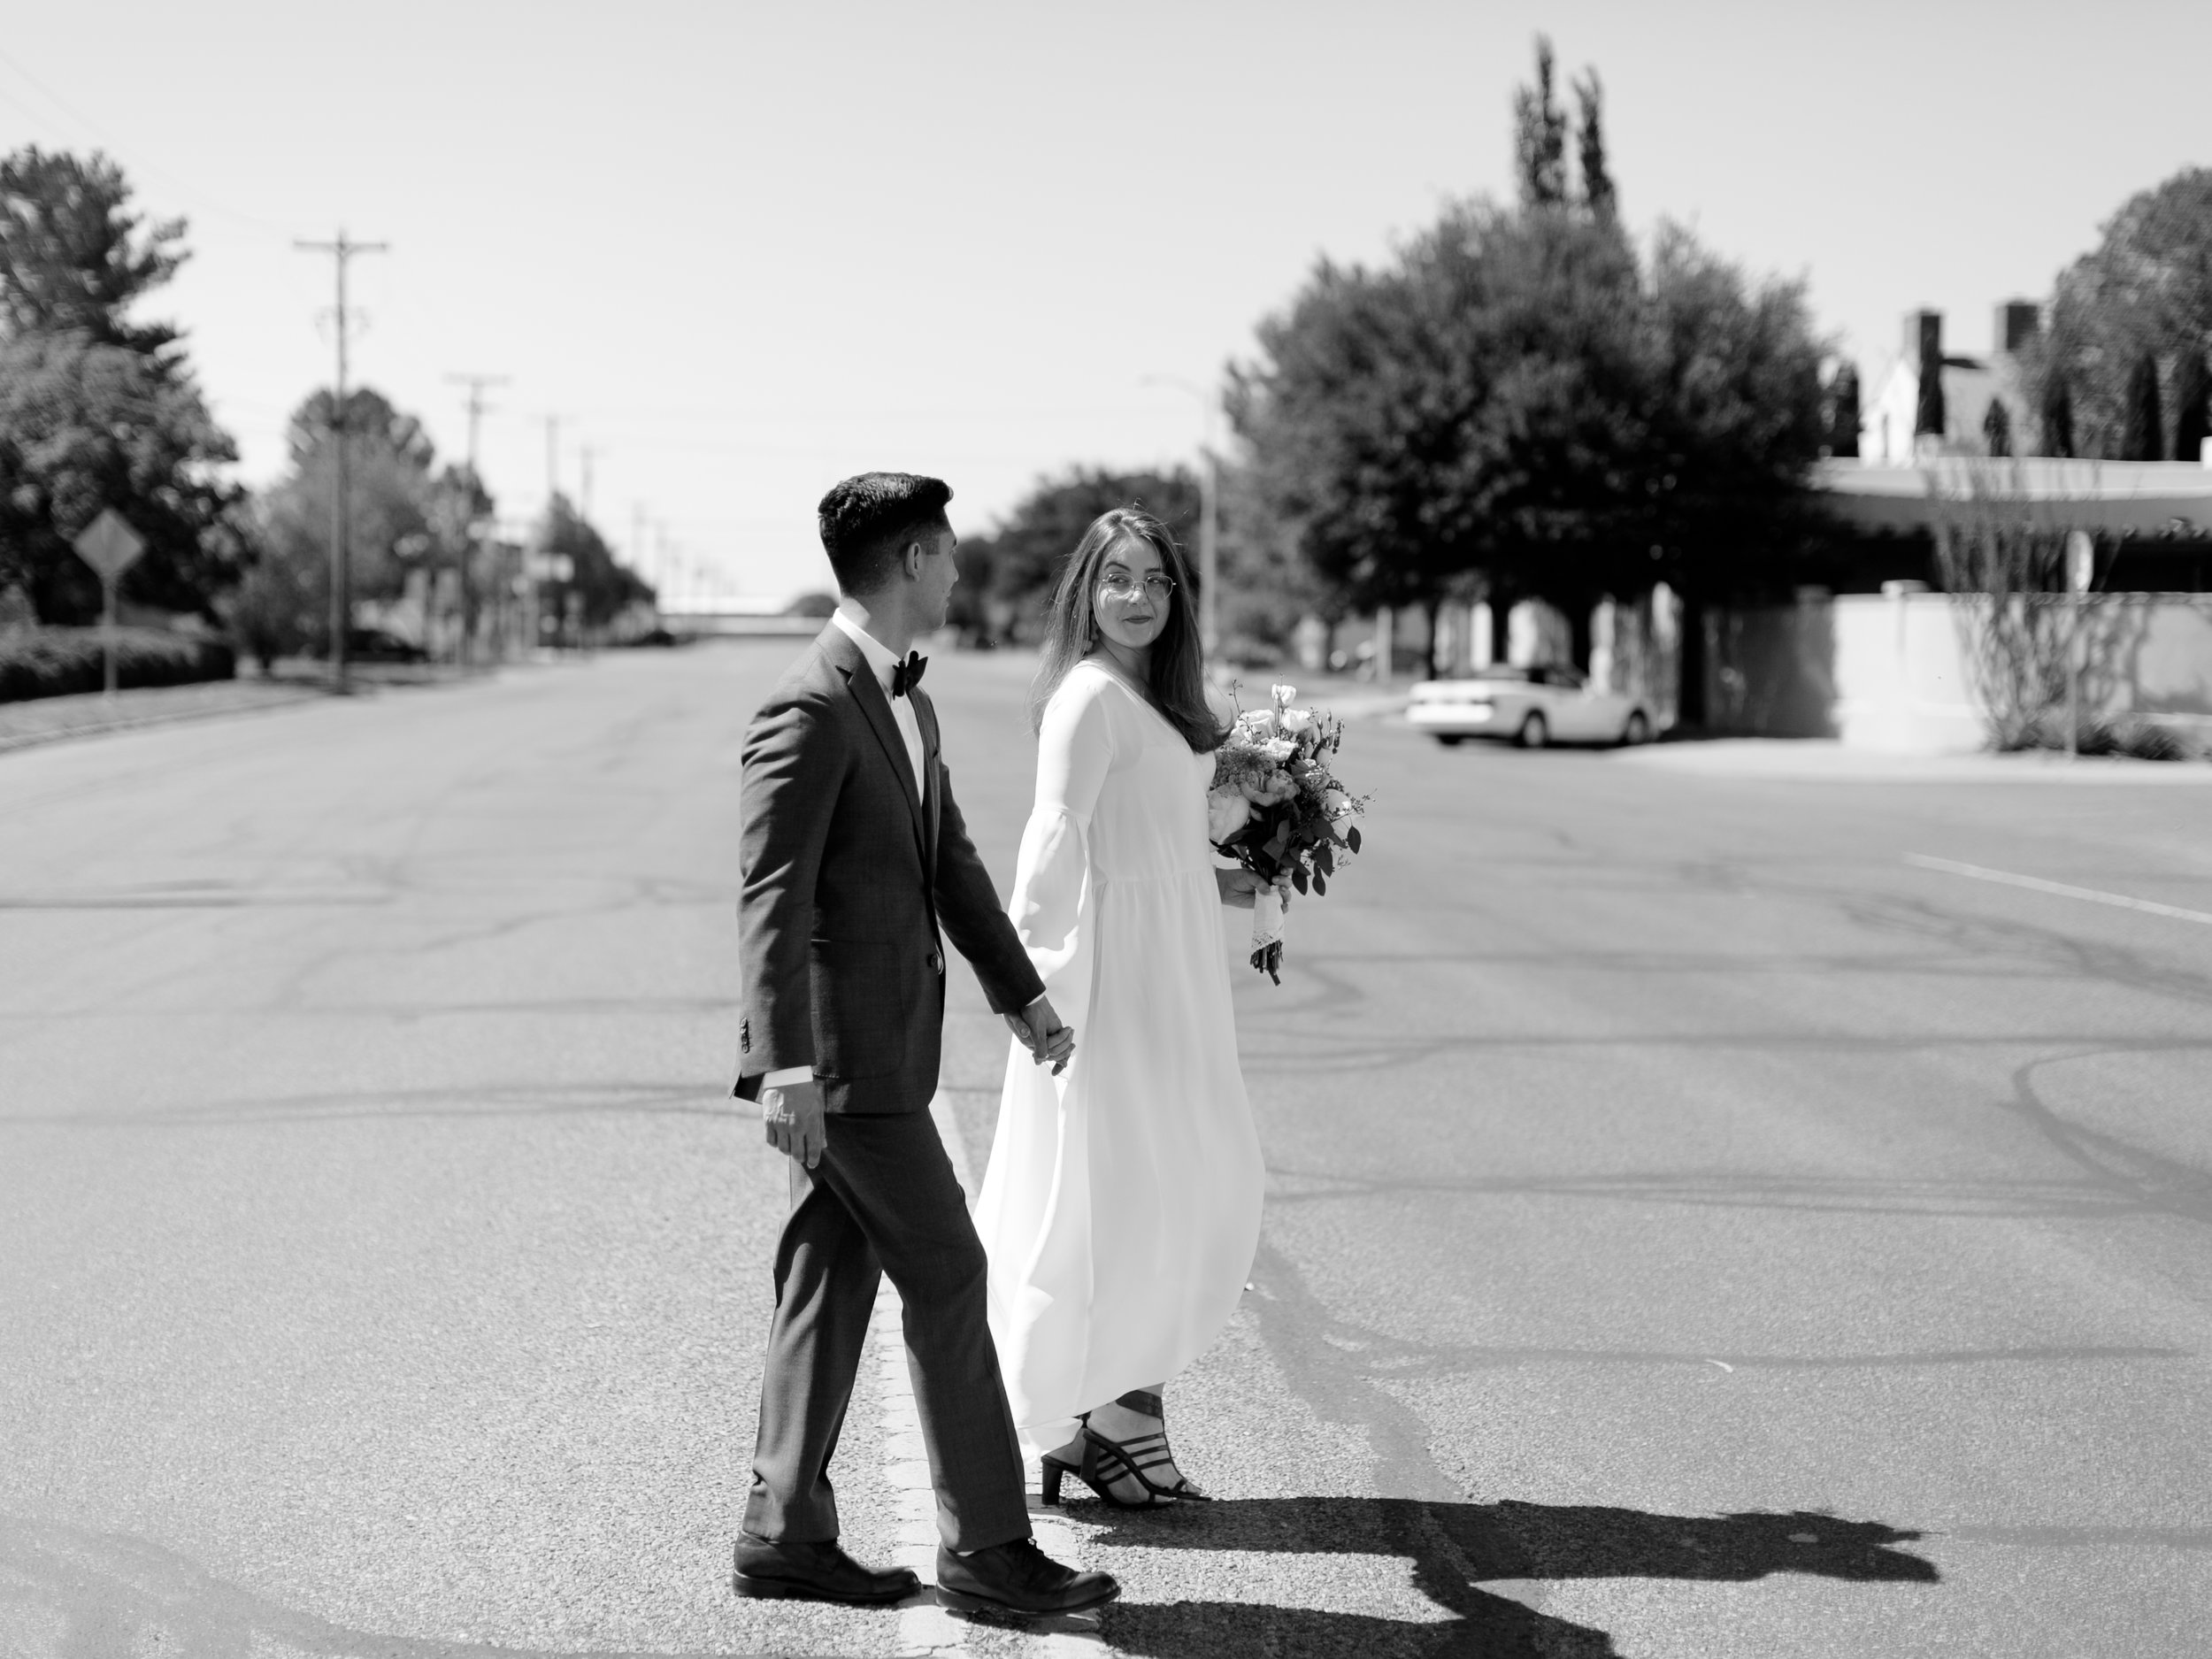 Best-Austin-Texas-Marfa-Wedding-Photographers-fine-art-film-167.jpg